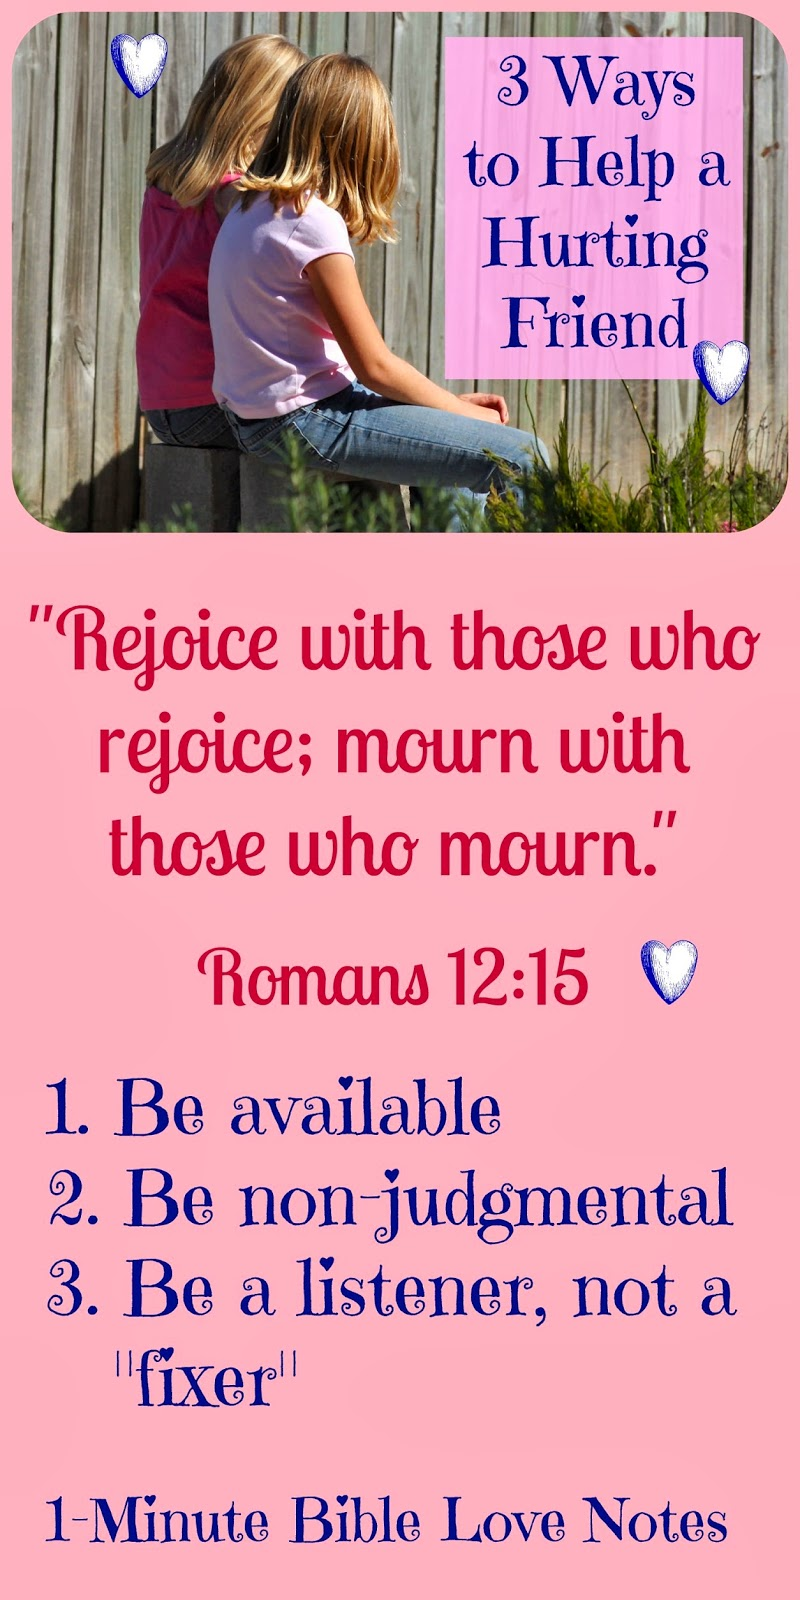 2 Corinthians 1:3-5, Psalm 69:20, Romans 12:15, helping a friend